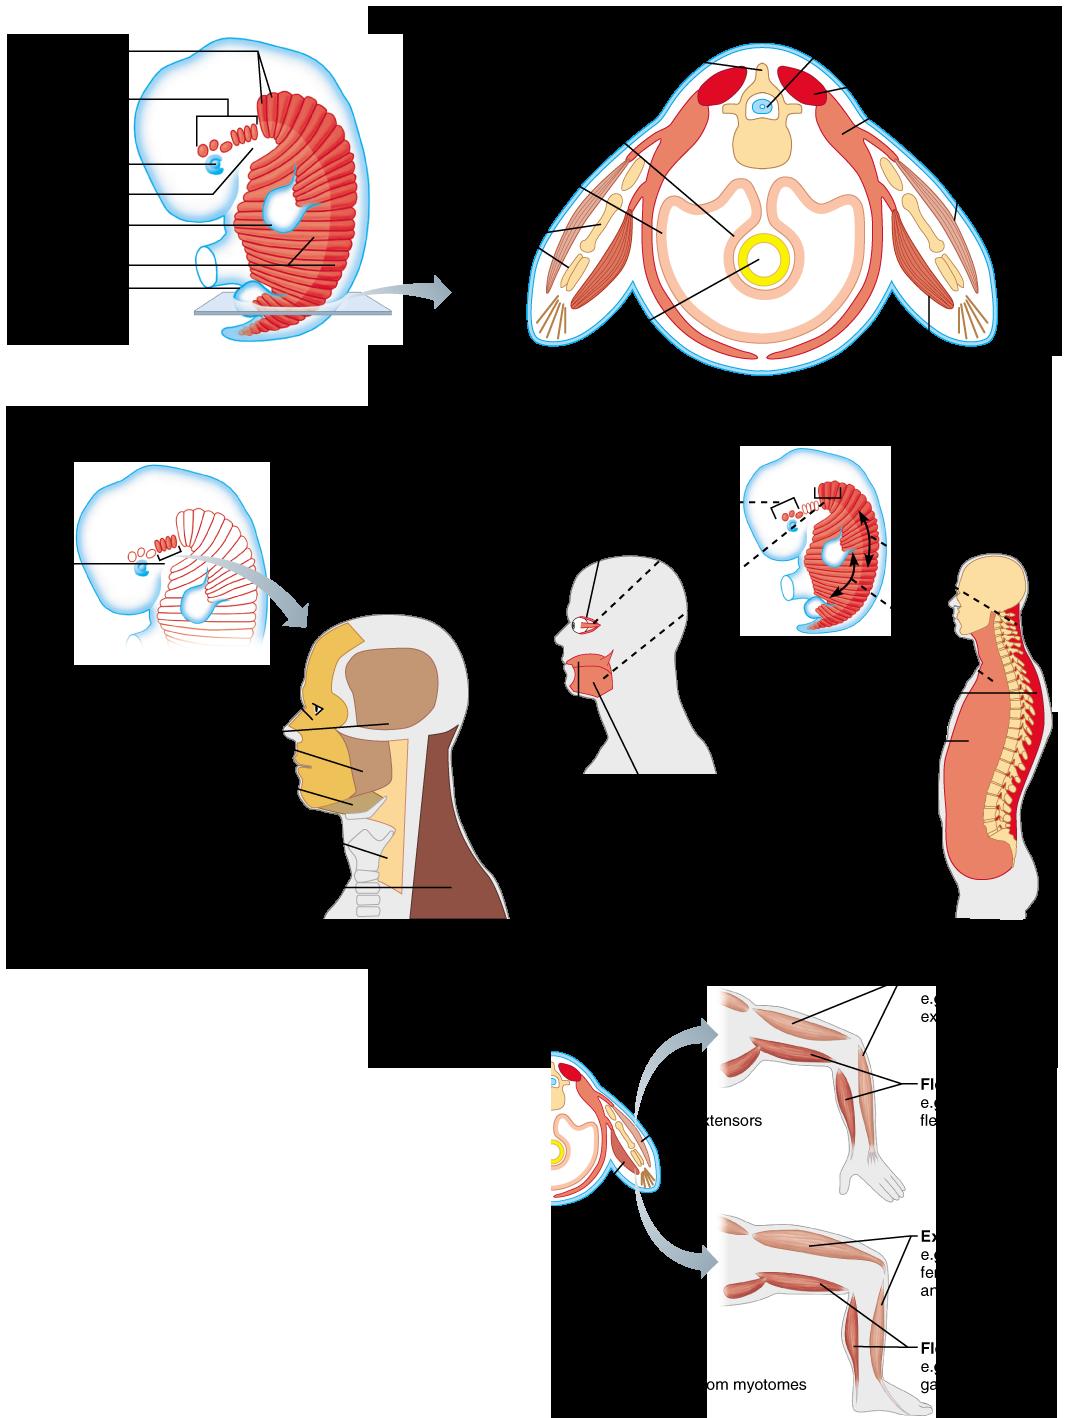 Organizational Scheme Based on Embryonic Development | Anatomy ...